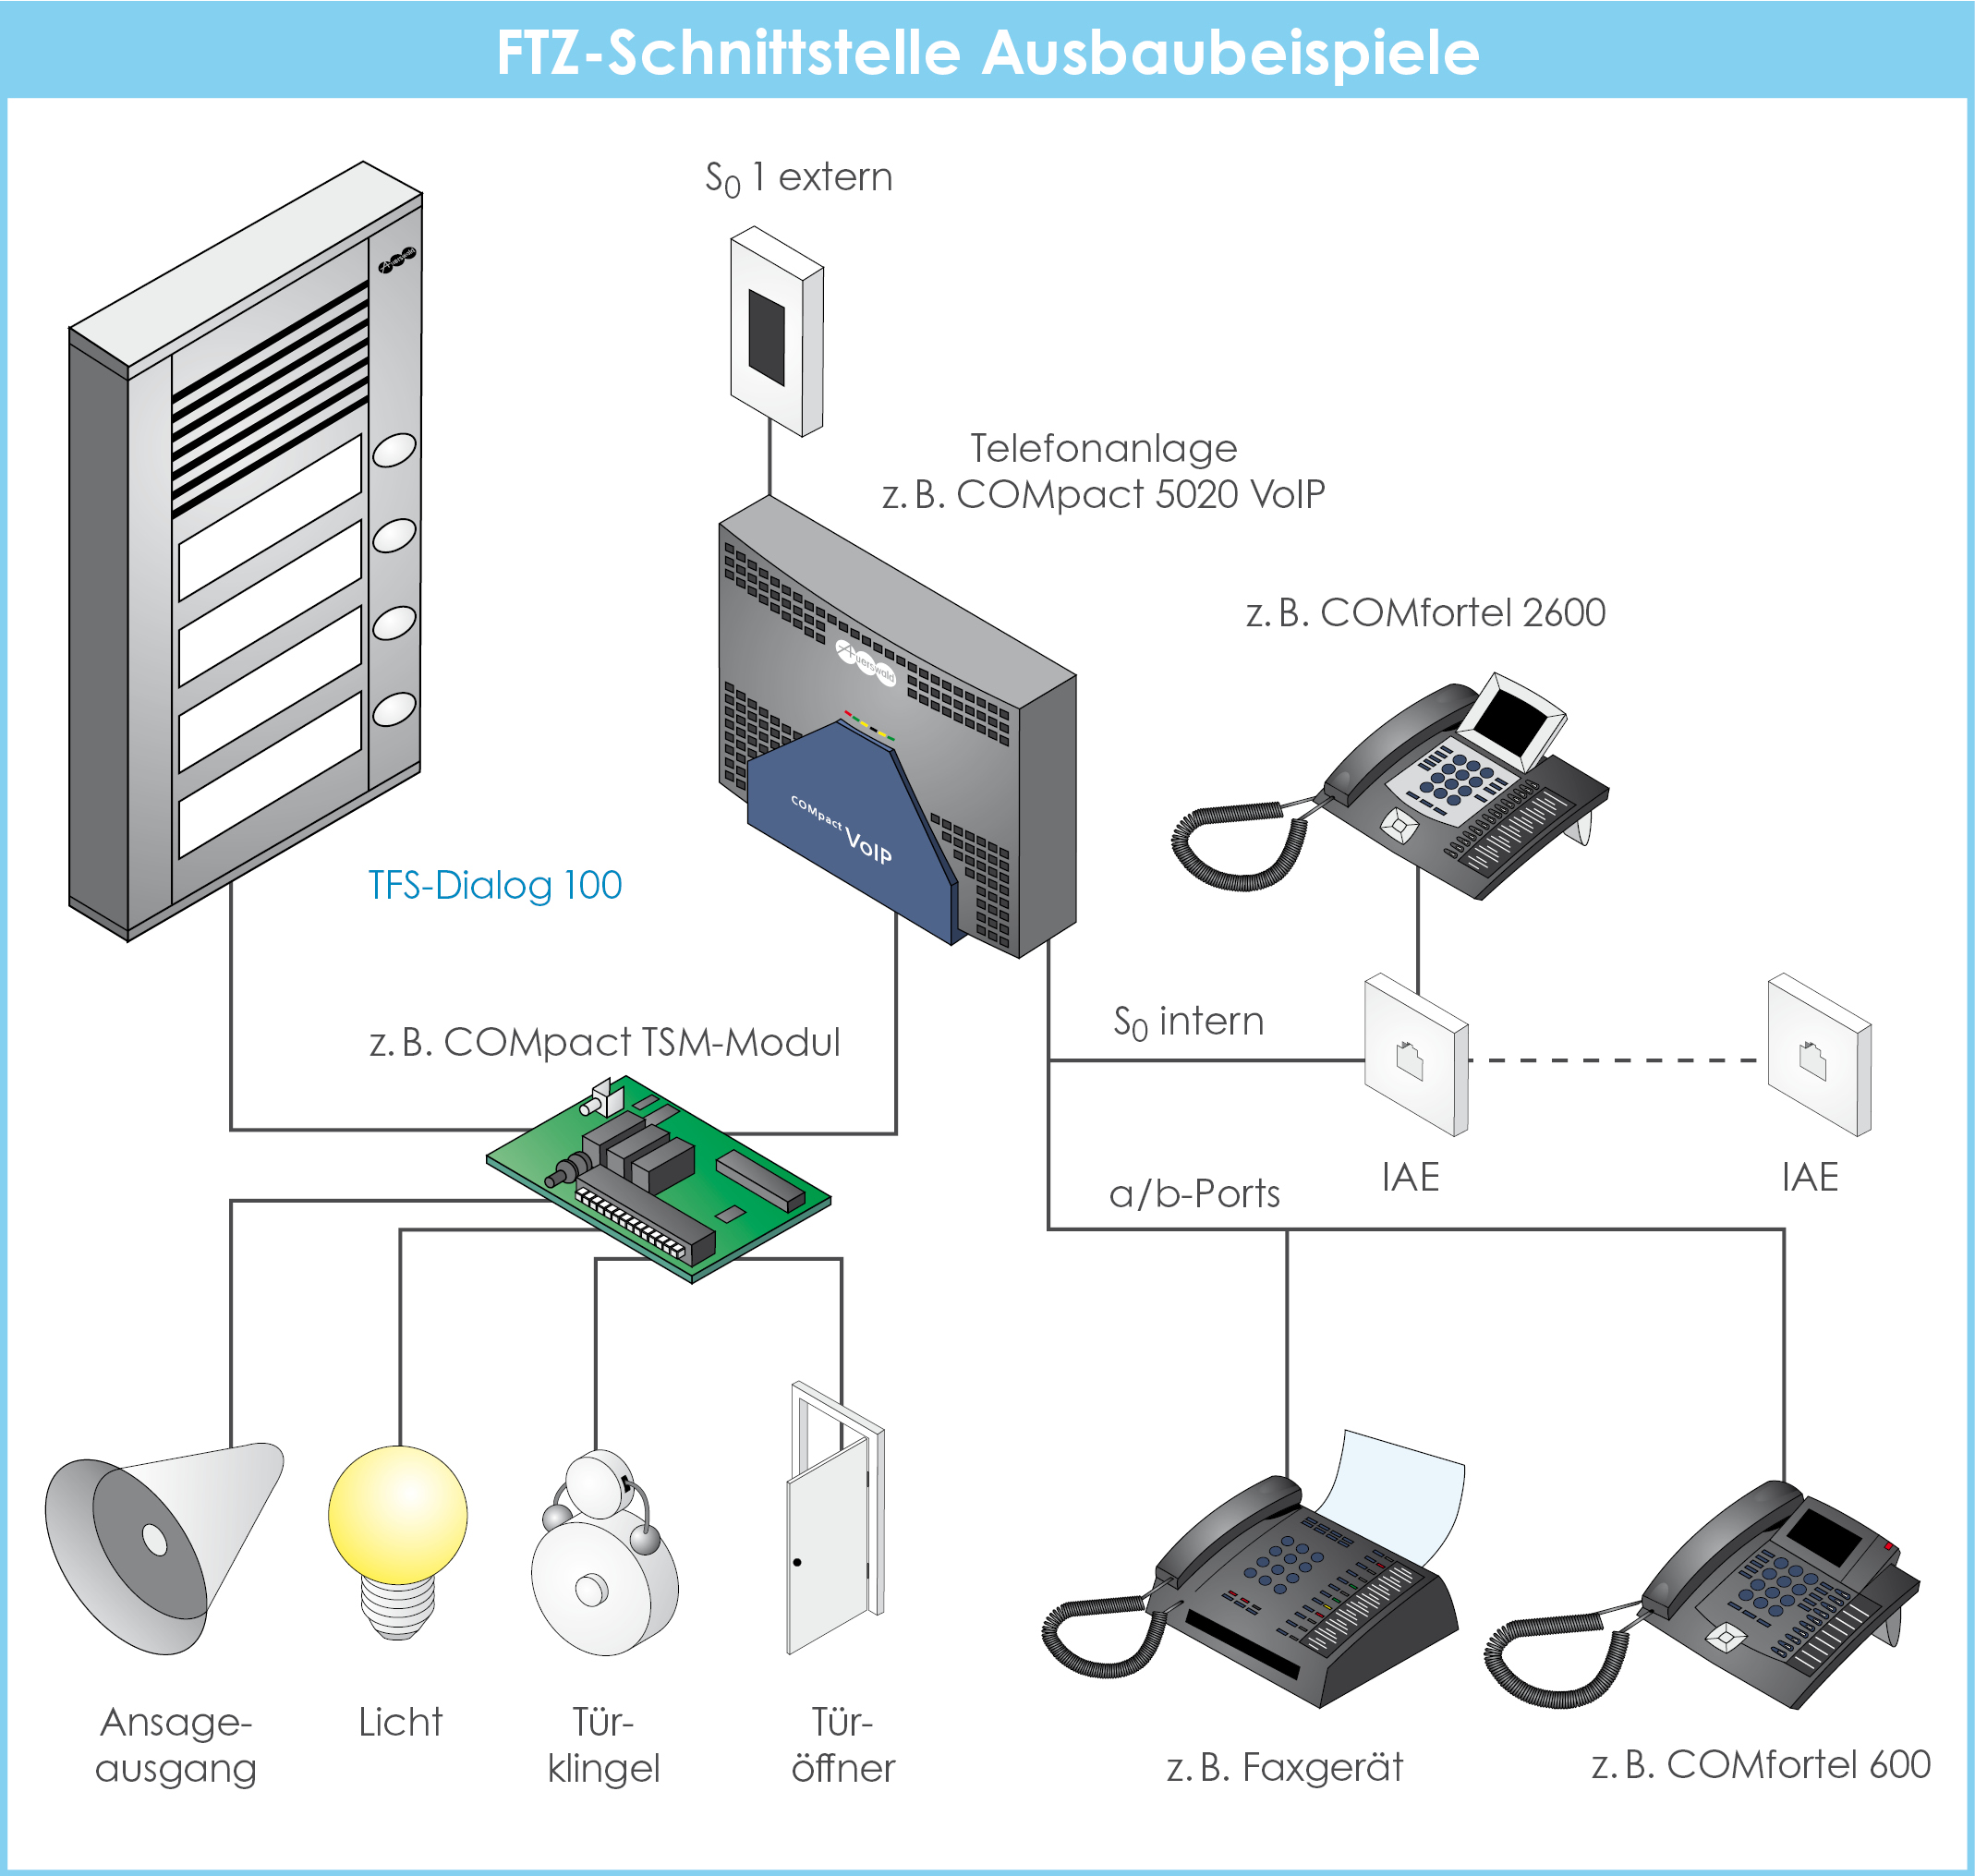 Anschaltgrafik_FTZ_Schnittstelle